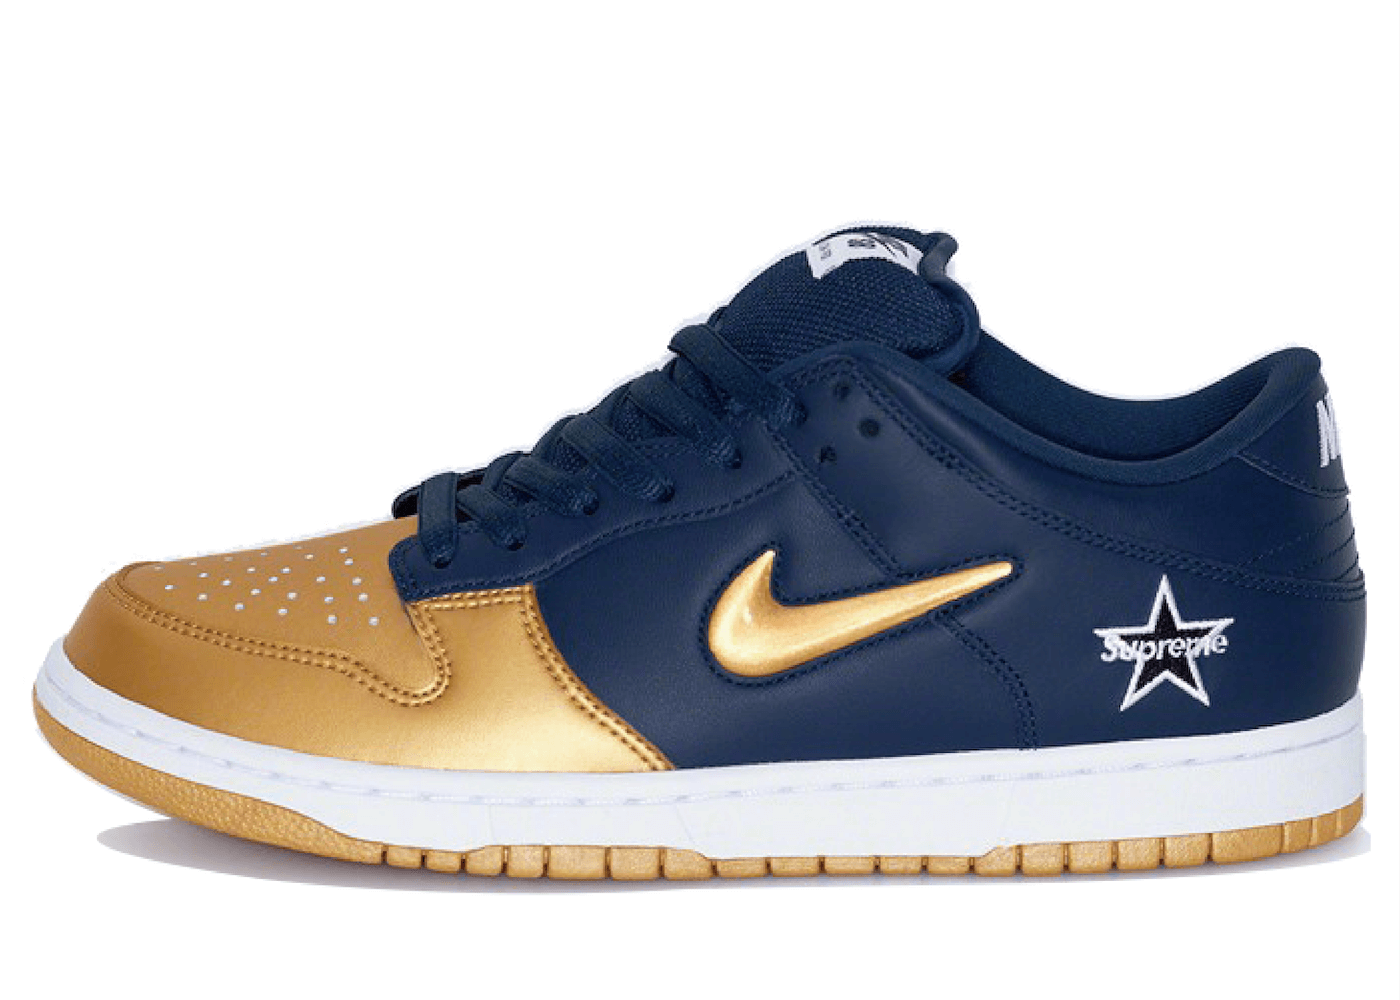 Supreme × Nike SB Dunk Low Jewel Gold